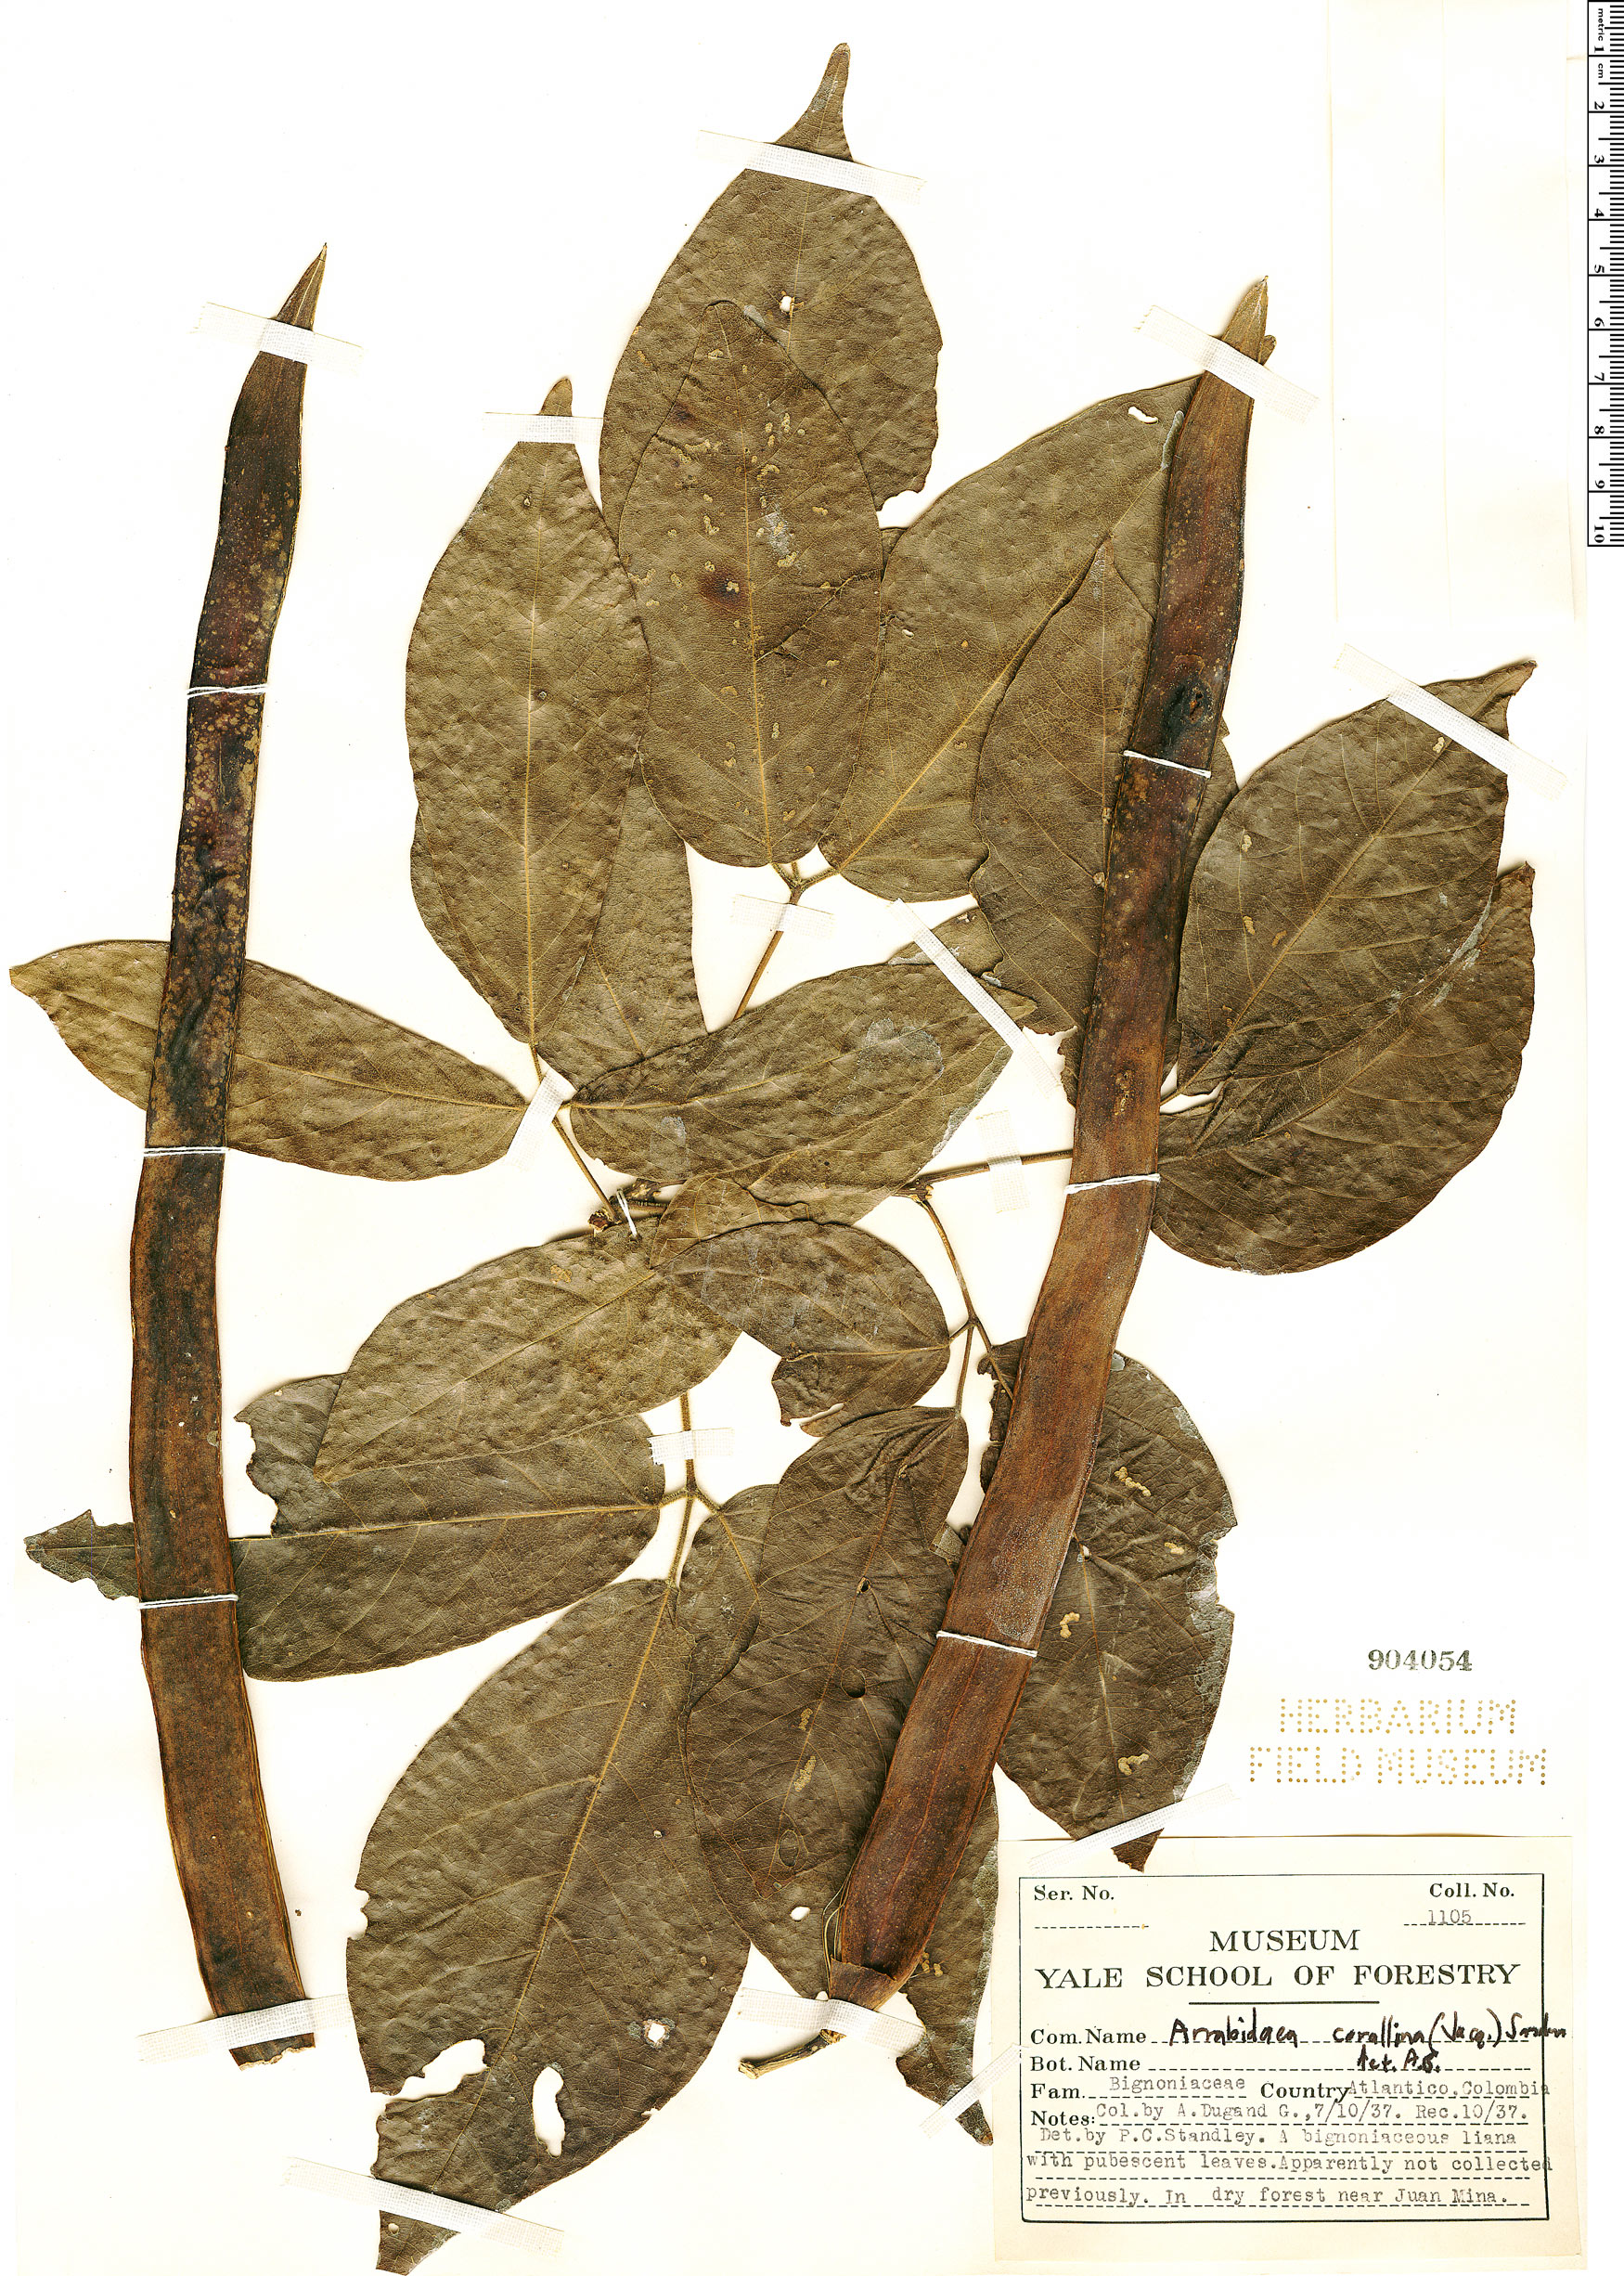 Specimen: Fridericia dichotoma